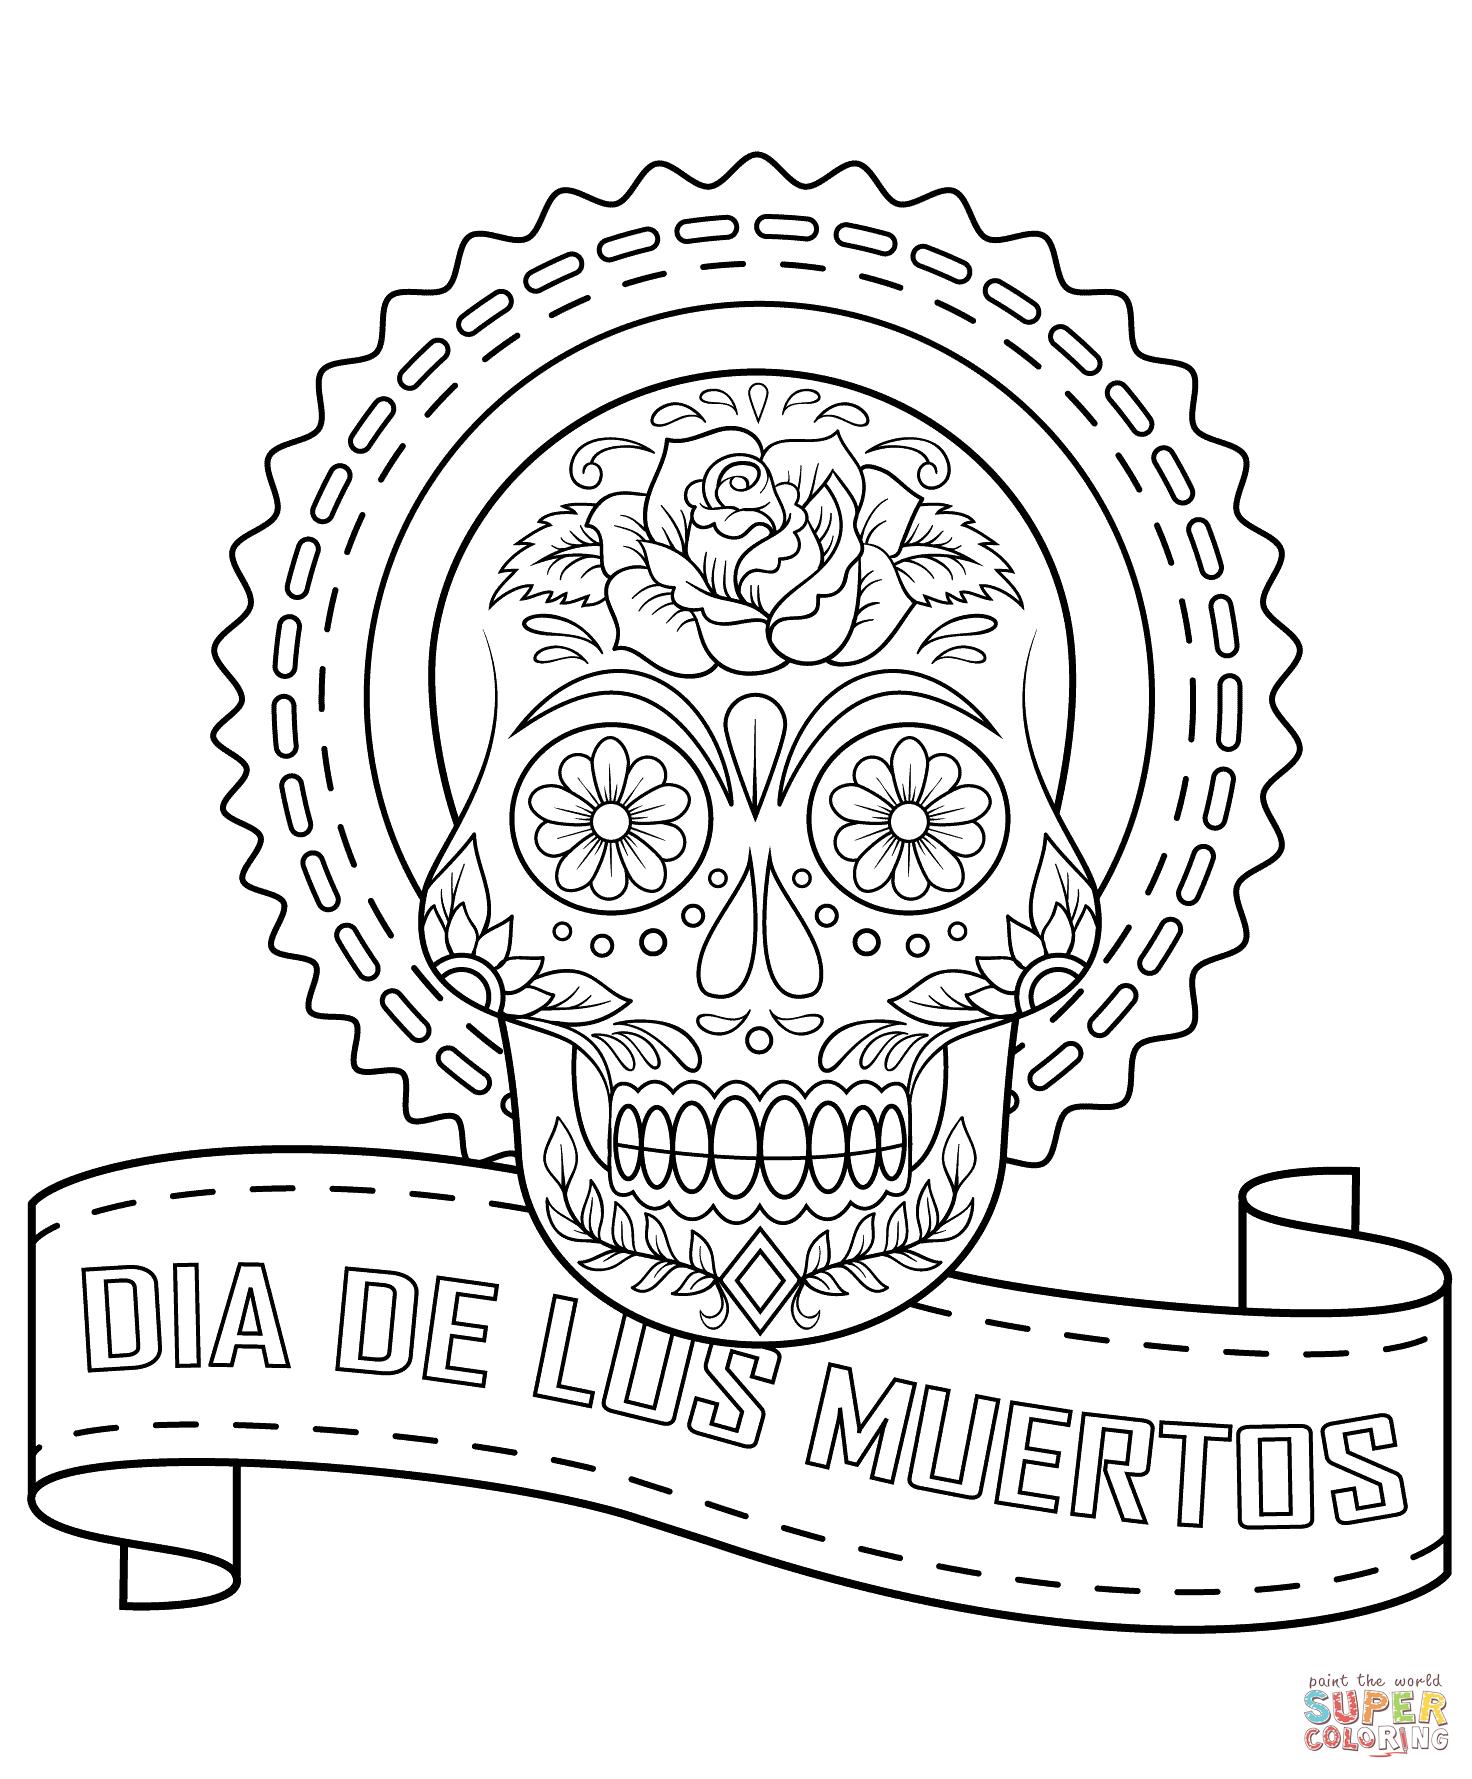 Dia de los Muertos coloring page | Halloween Stuff | Pinterest | Dia ...